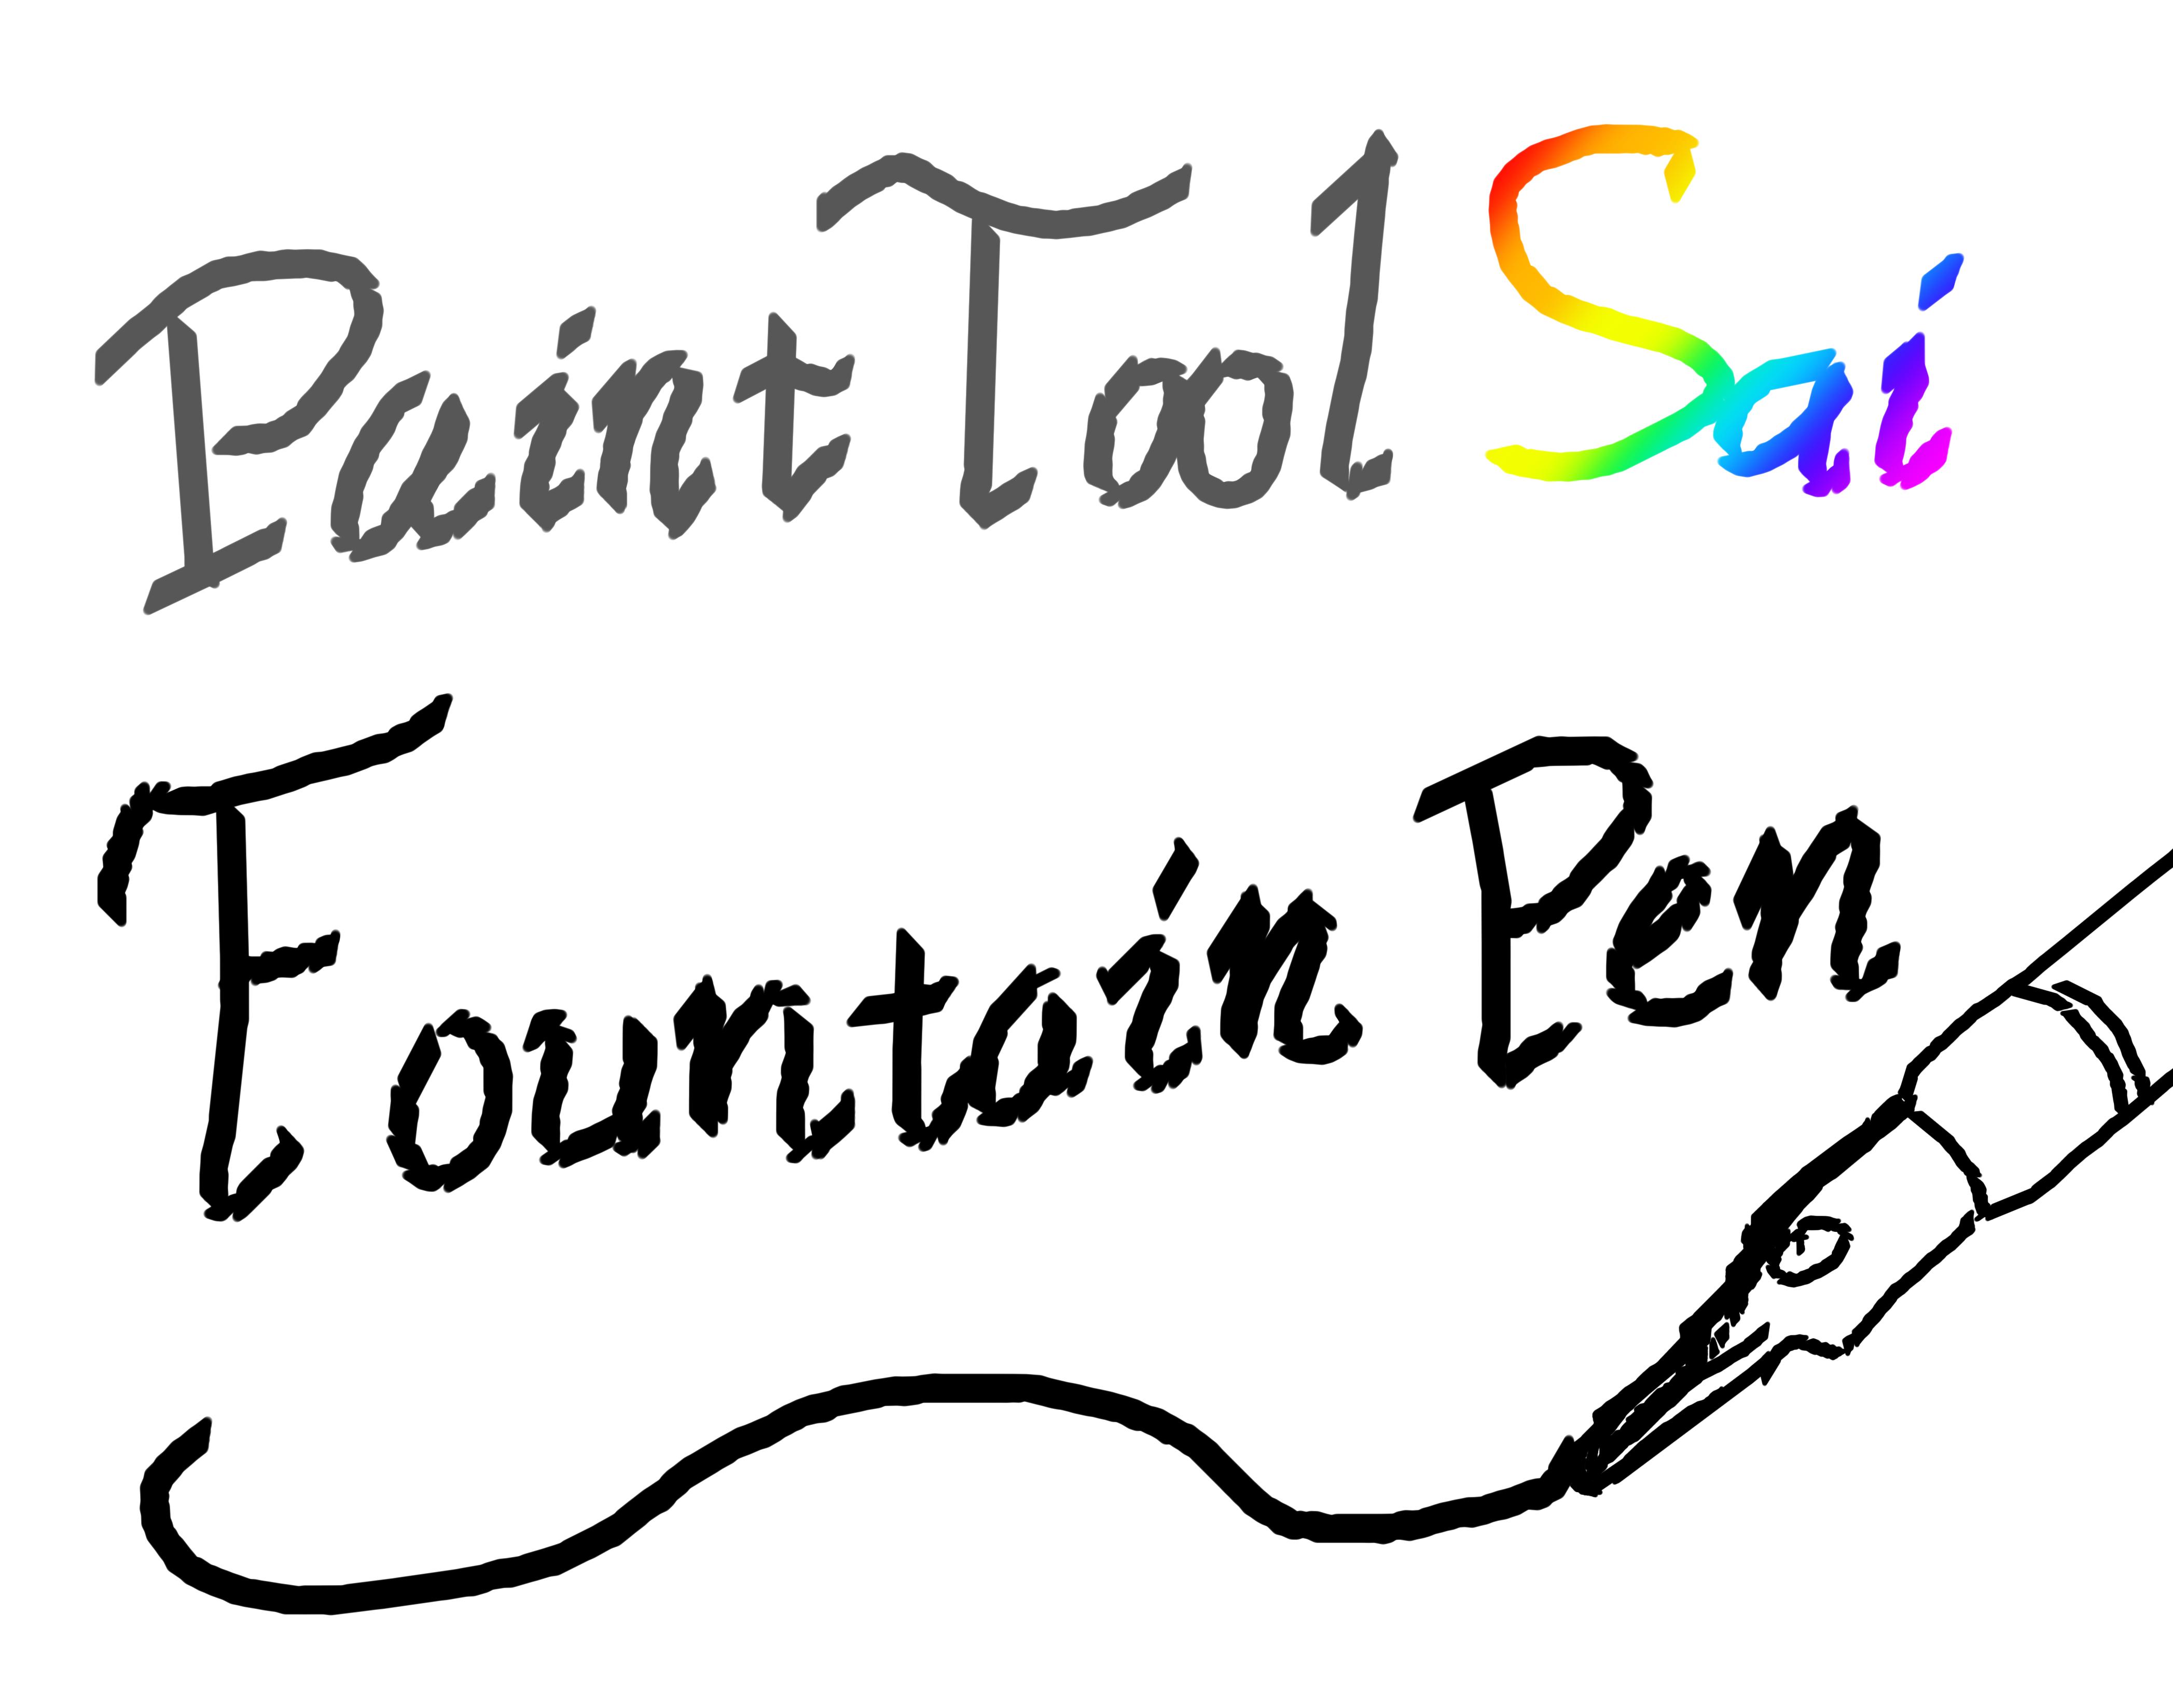 paint tool sai pen brush download